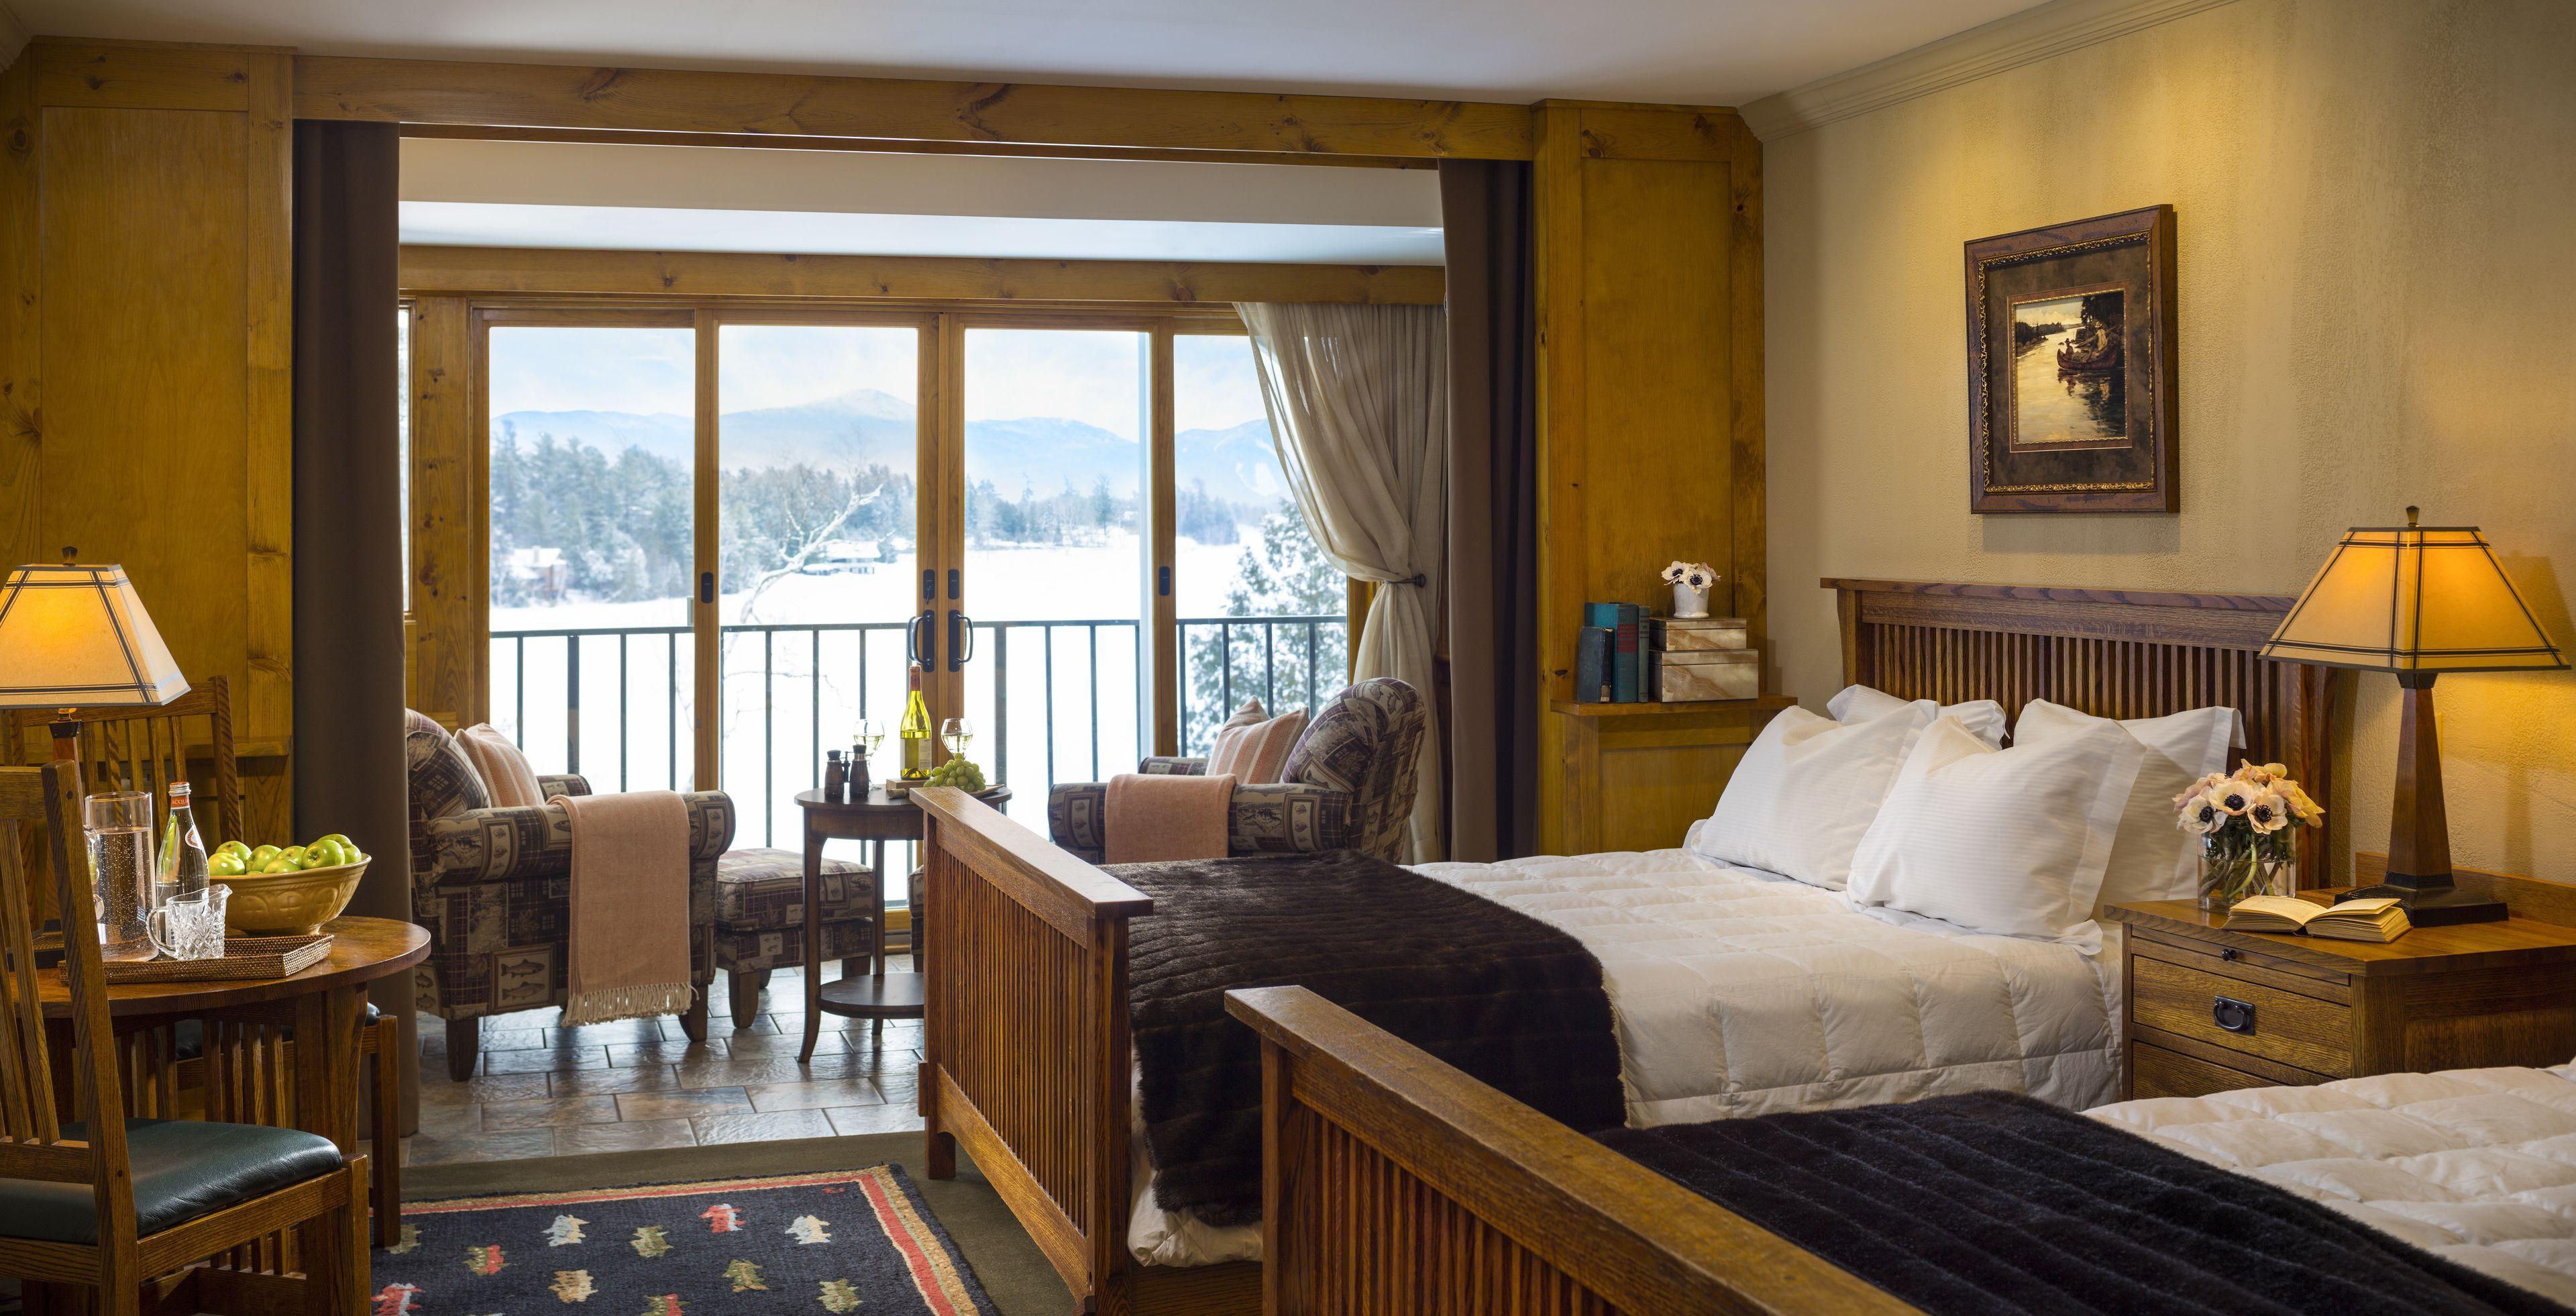 Courtesy of Mirror Lake Inn Resort and Spa / Expedia.com